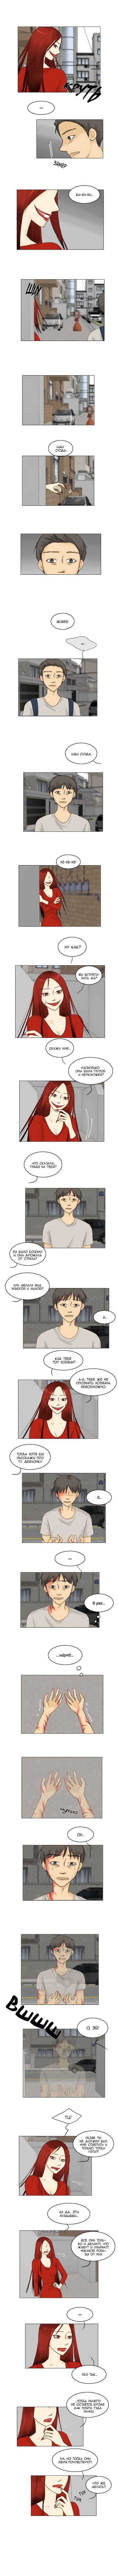 https://r2.ninemanga.com/comics/pic3/8/31048/1295162/1546305881528.jpg Page 3